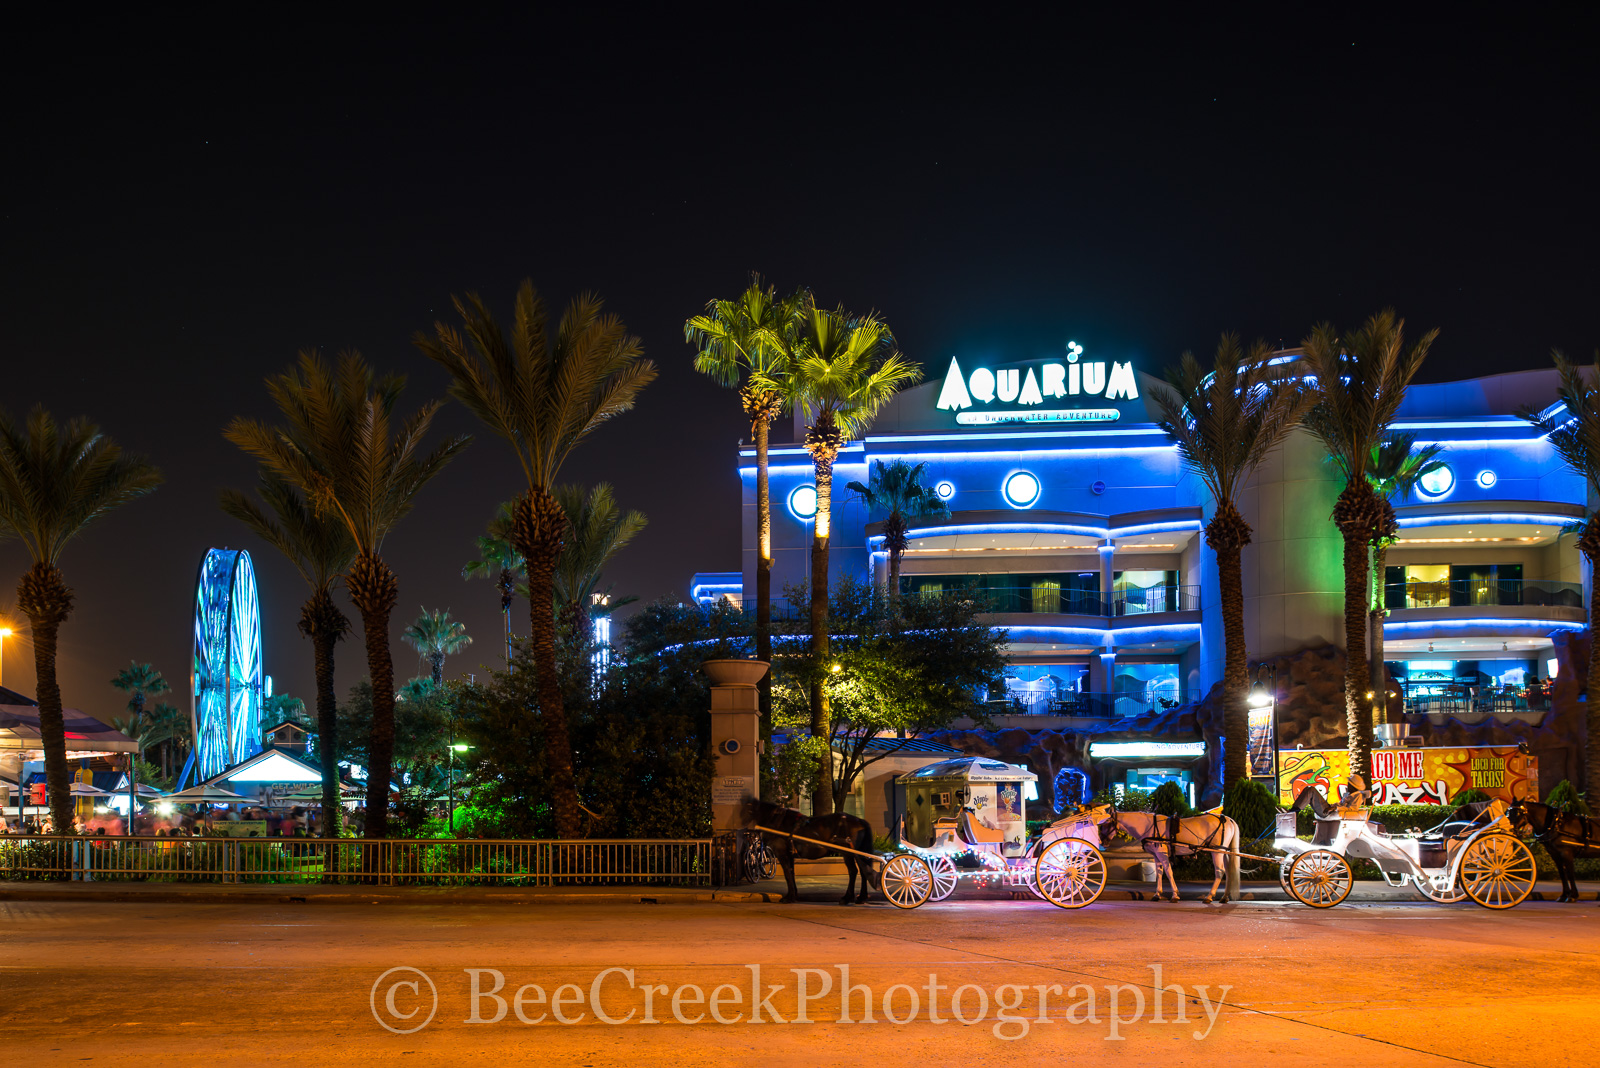 Aquarium, Houston, alligators, aqua blue, birds, carriages, cityscape, dancing, events, festive blue lights, fish, horse and buggies, mamals, reptiles, themes, tigers, tourist, photo